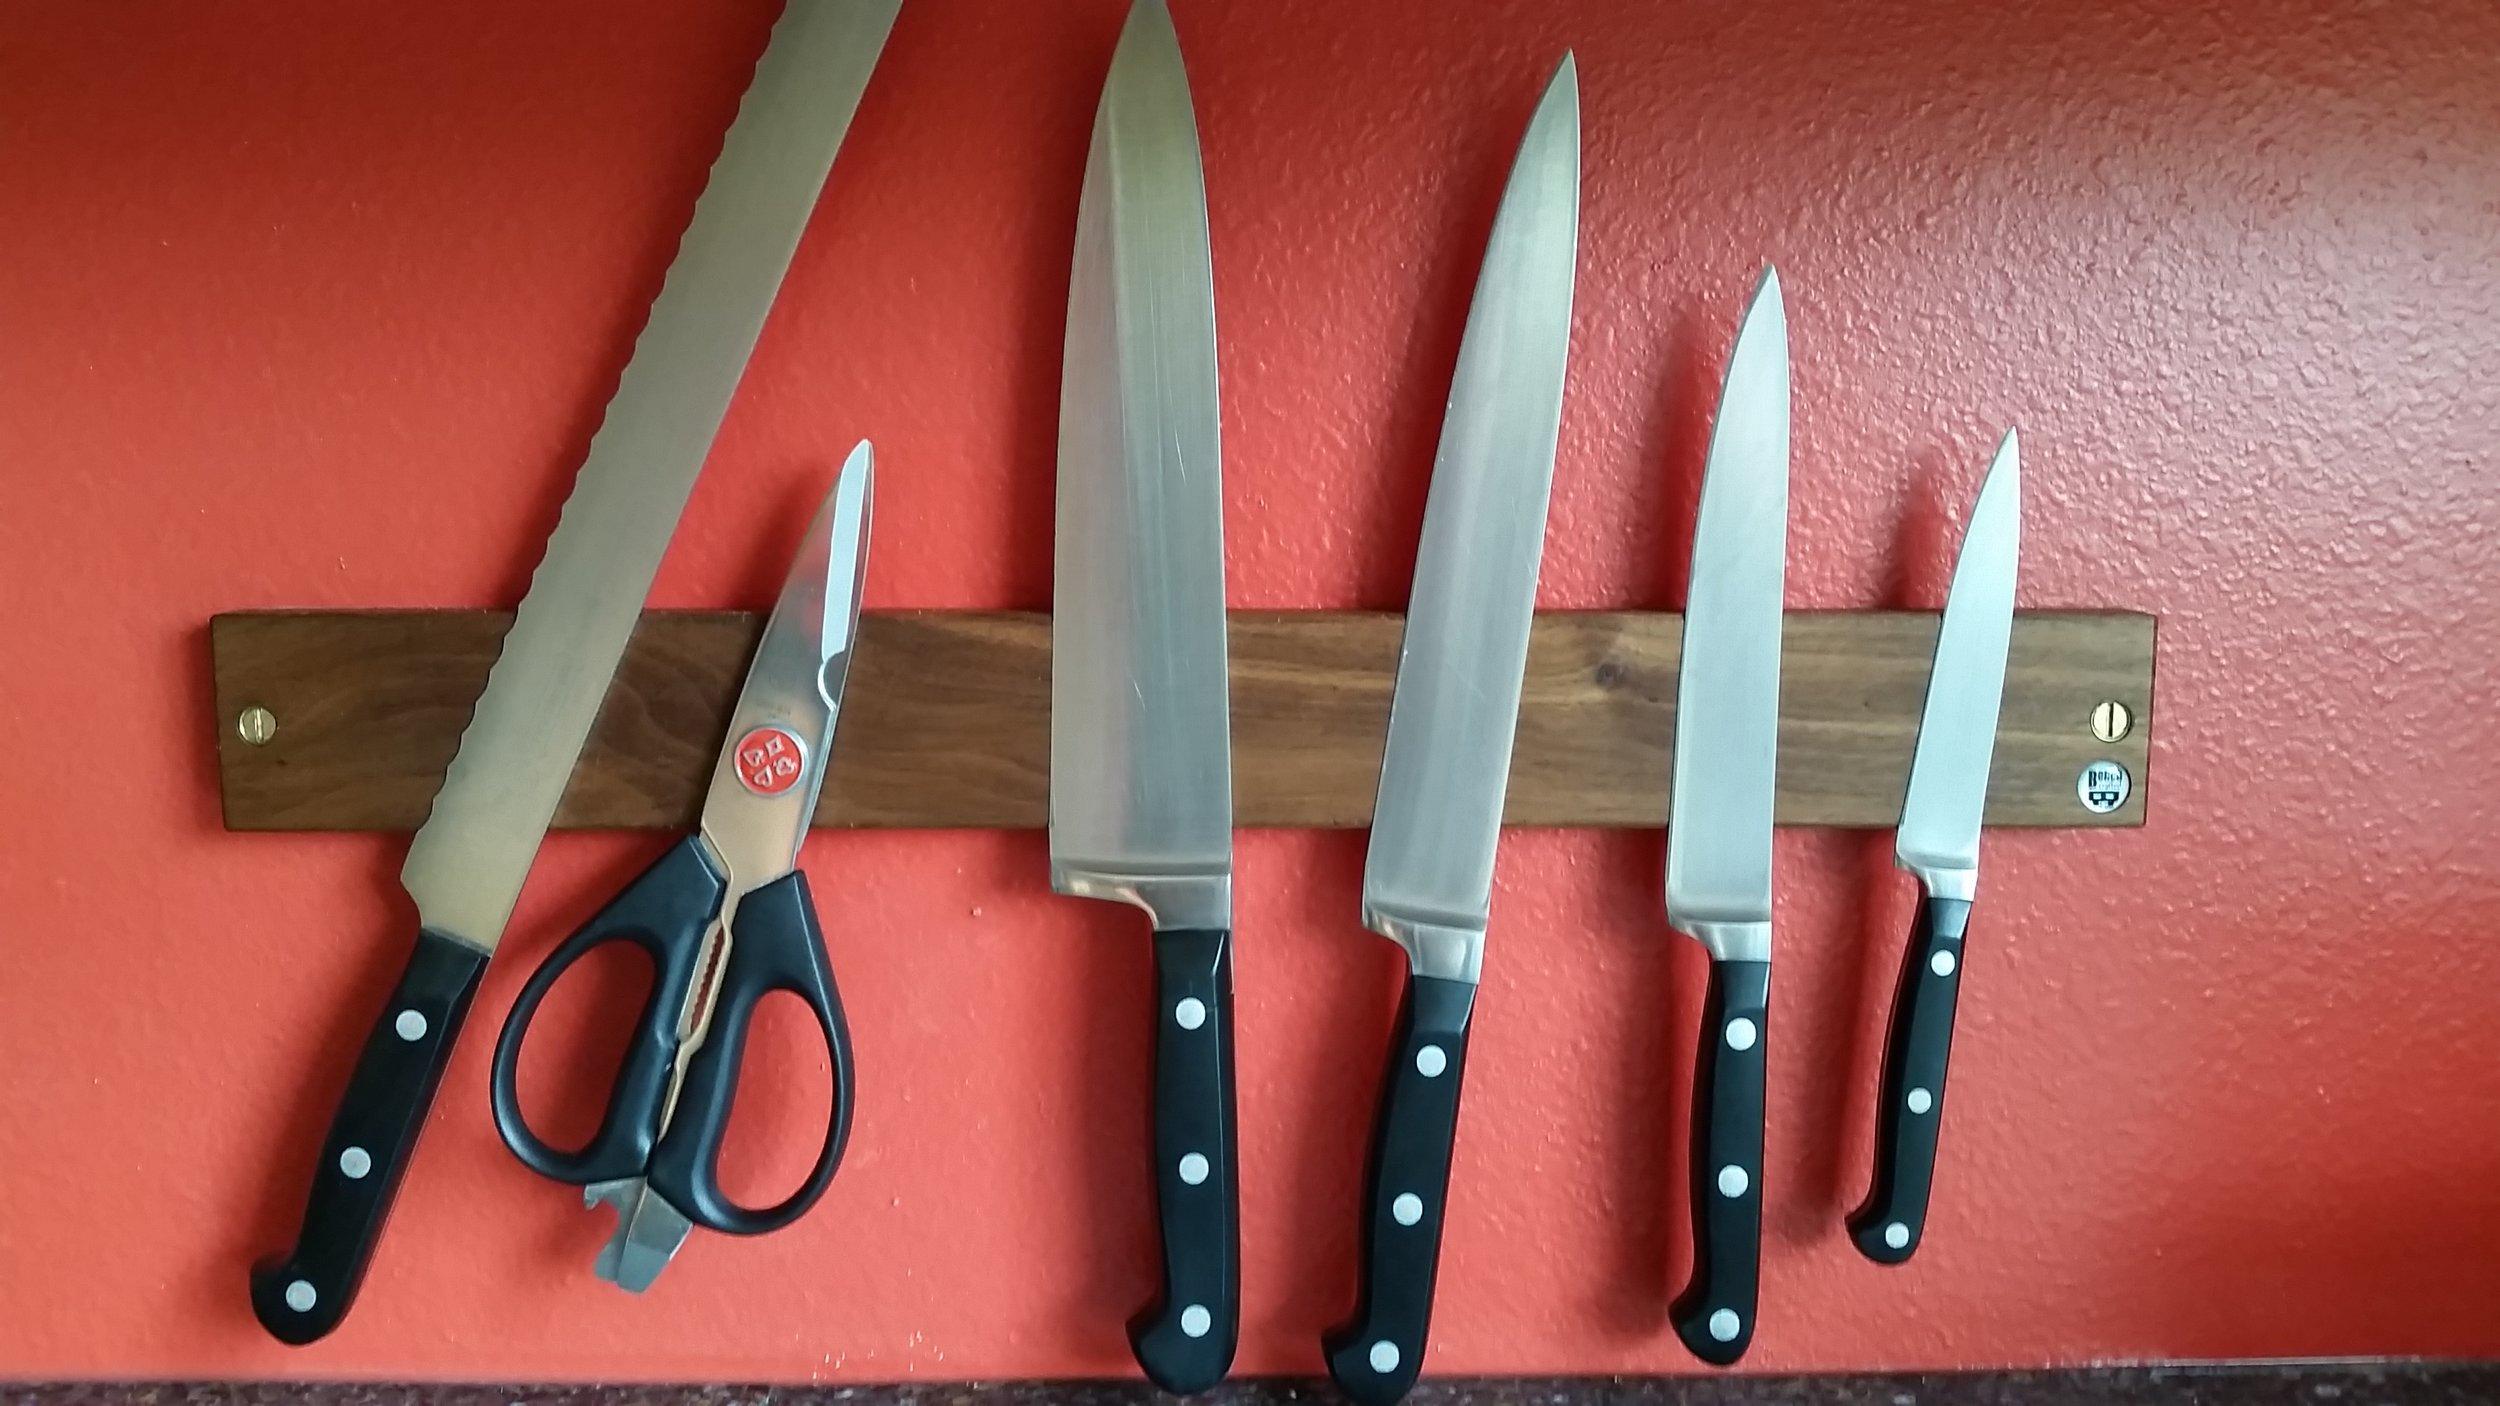 Sharp knives!